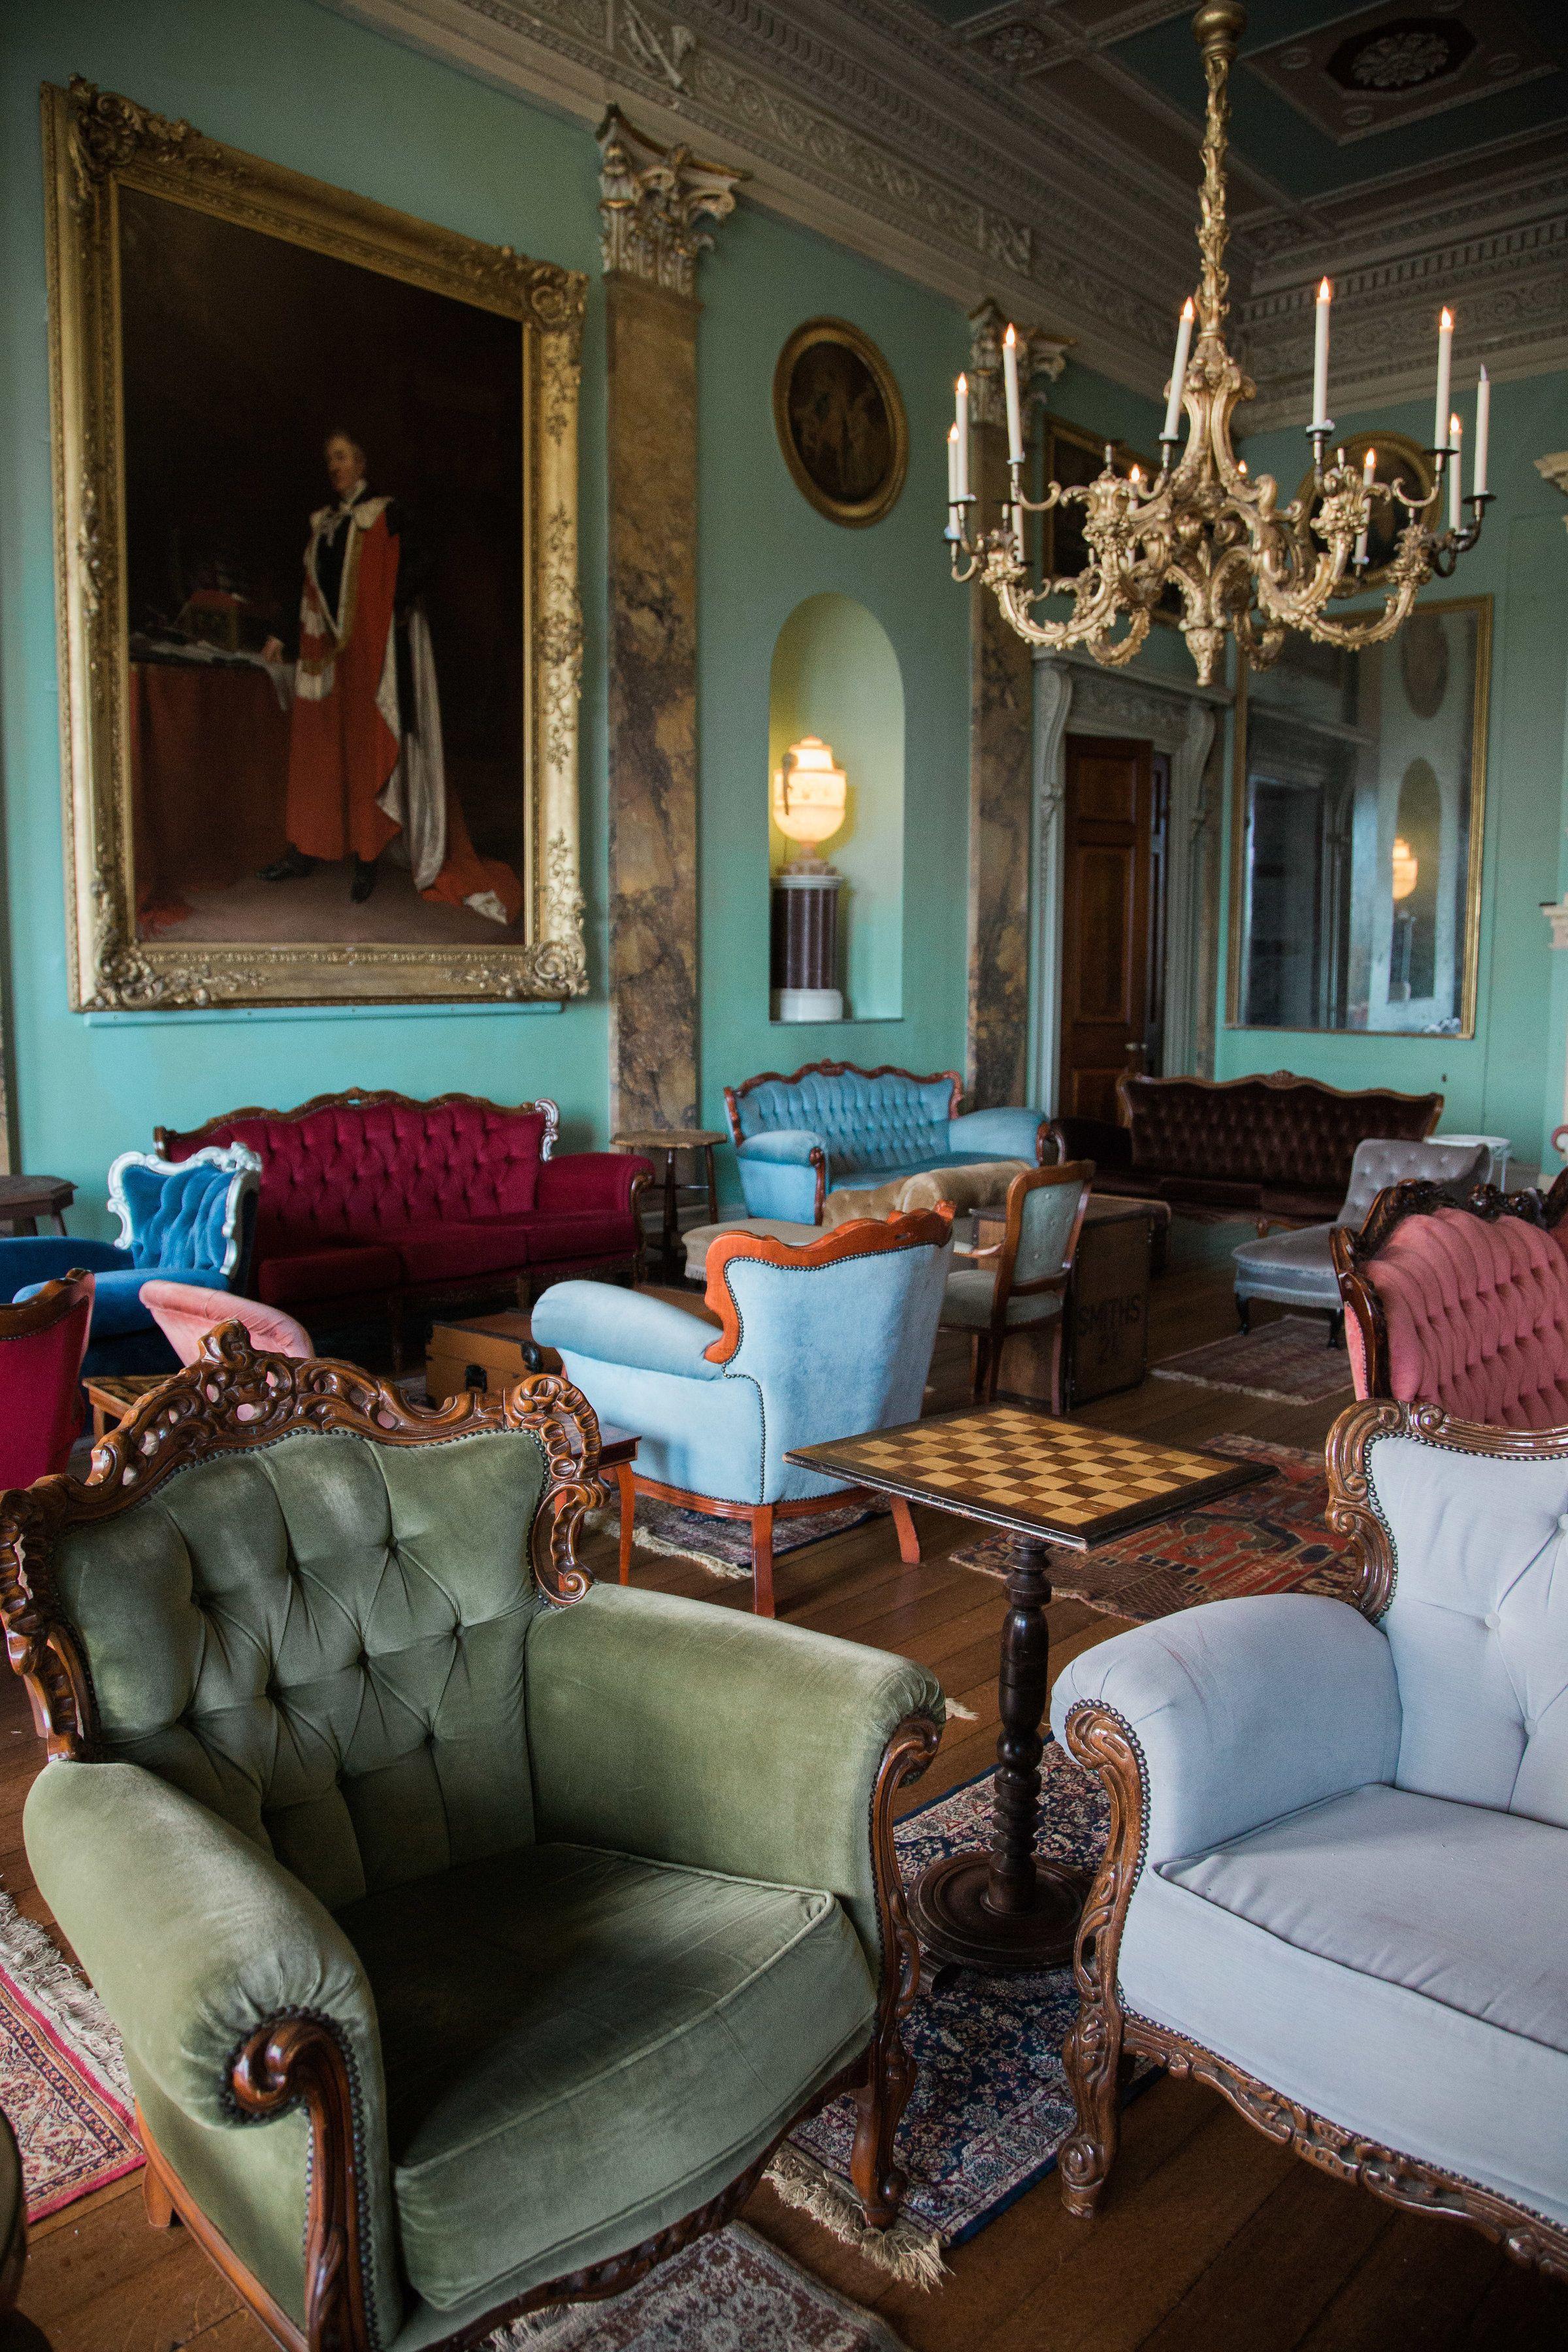 Vinatge Sofa Wedding Set Up At Powderham Castle. Image By